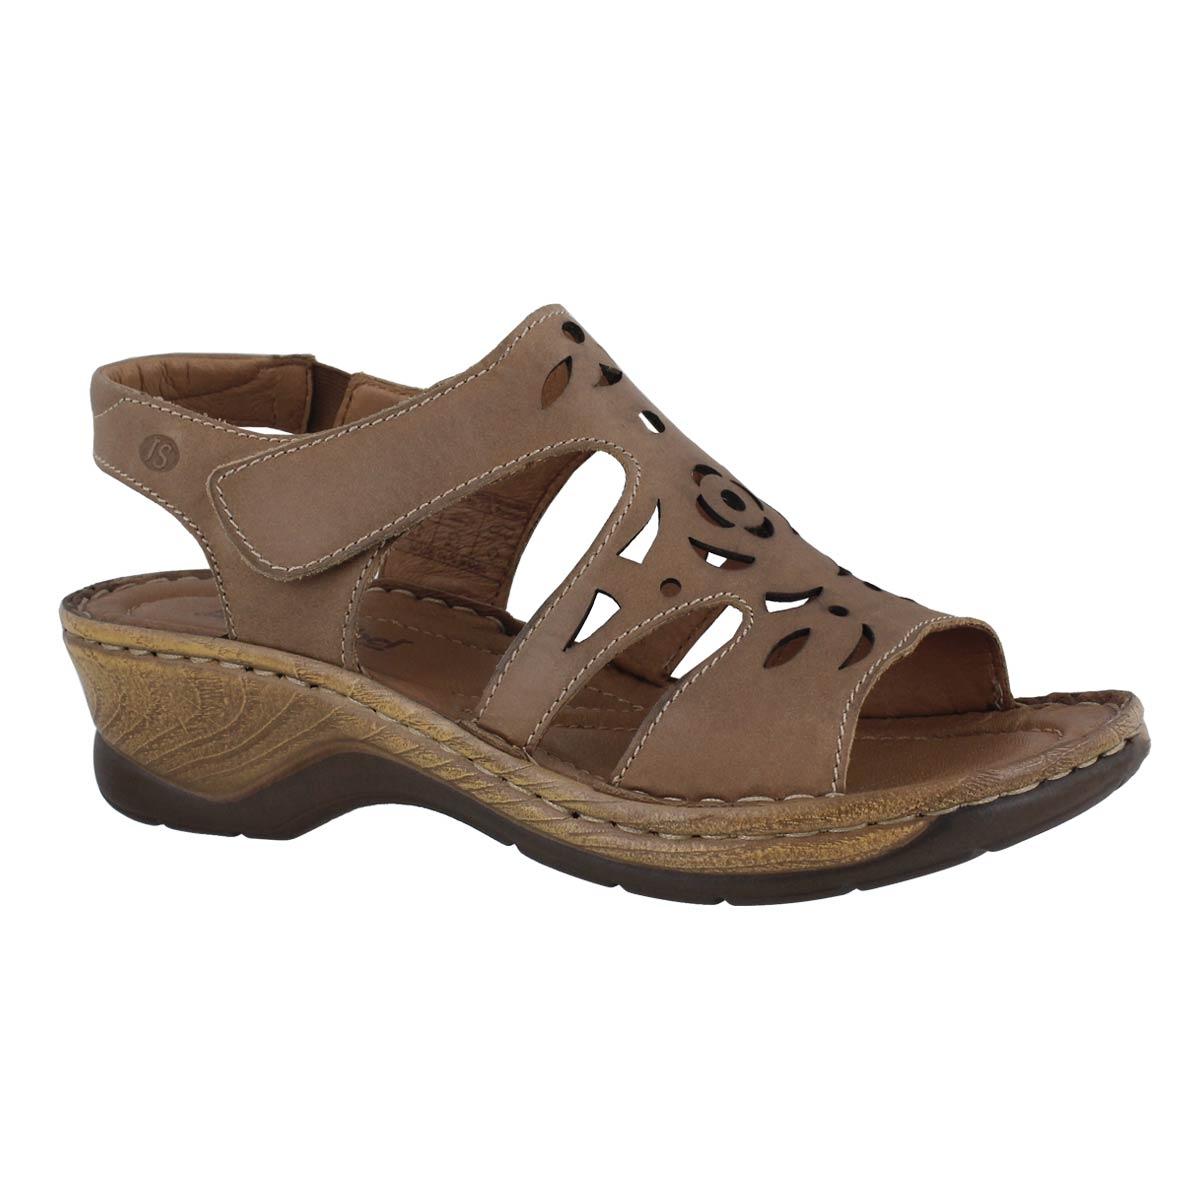 Women's CATALONIA 56 sand sandals